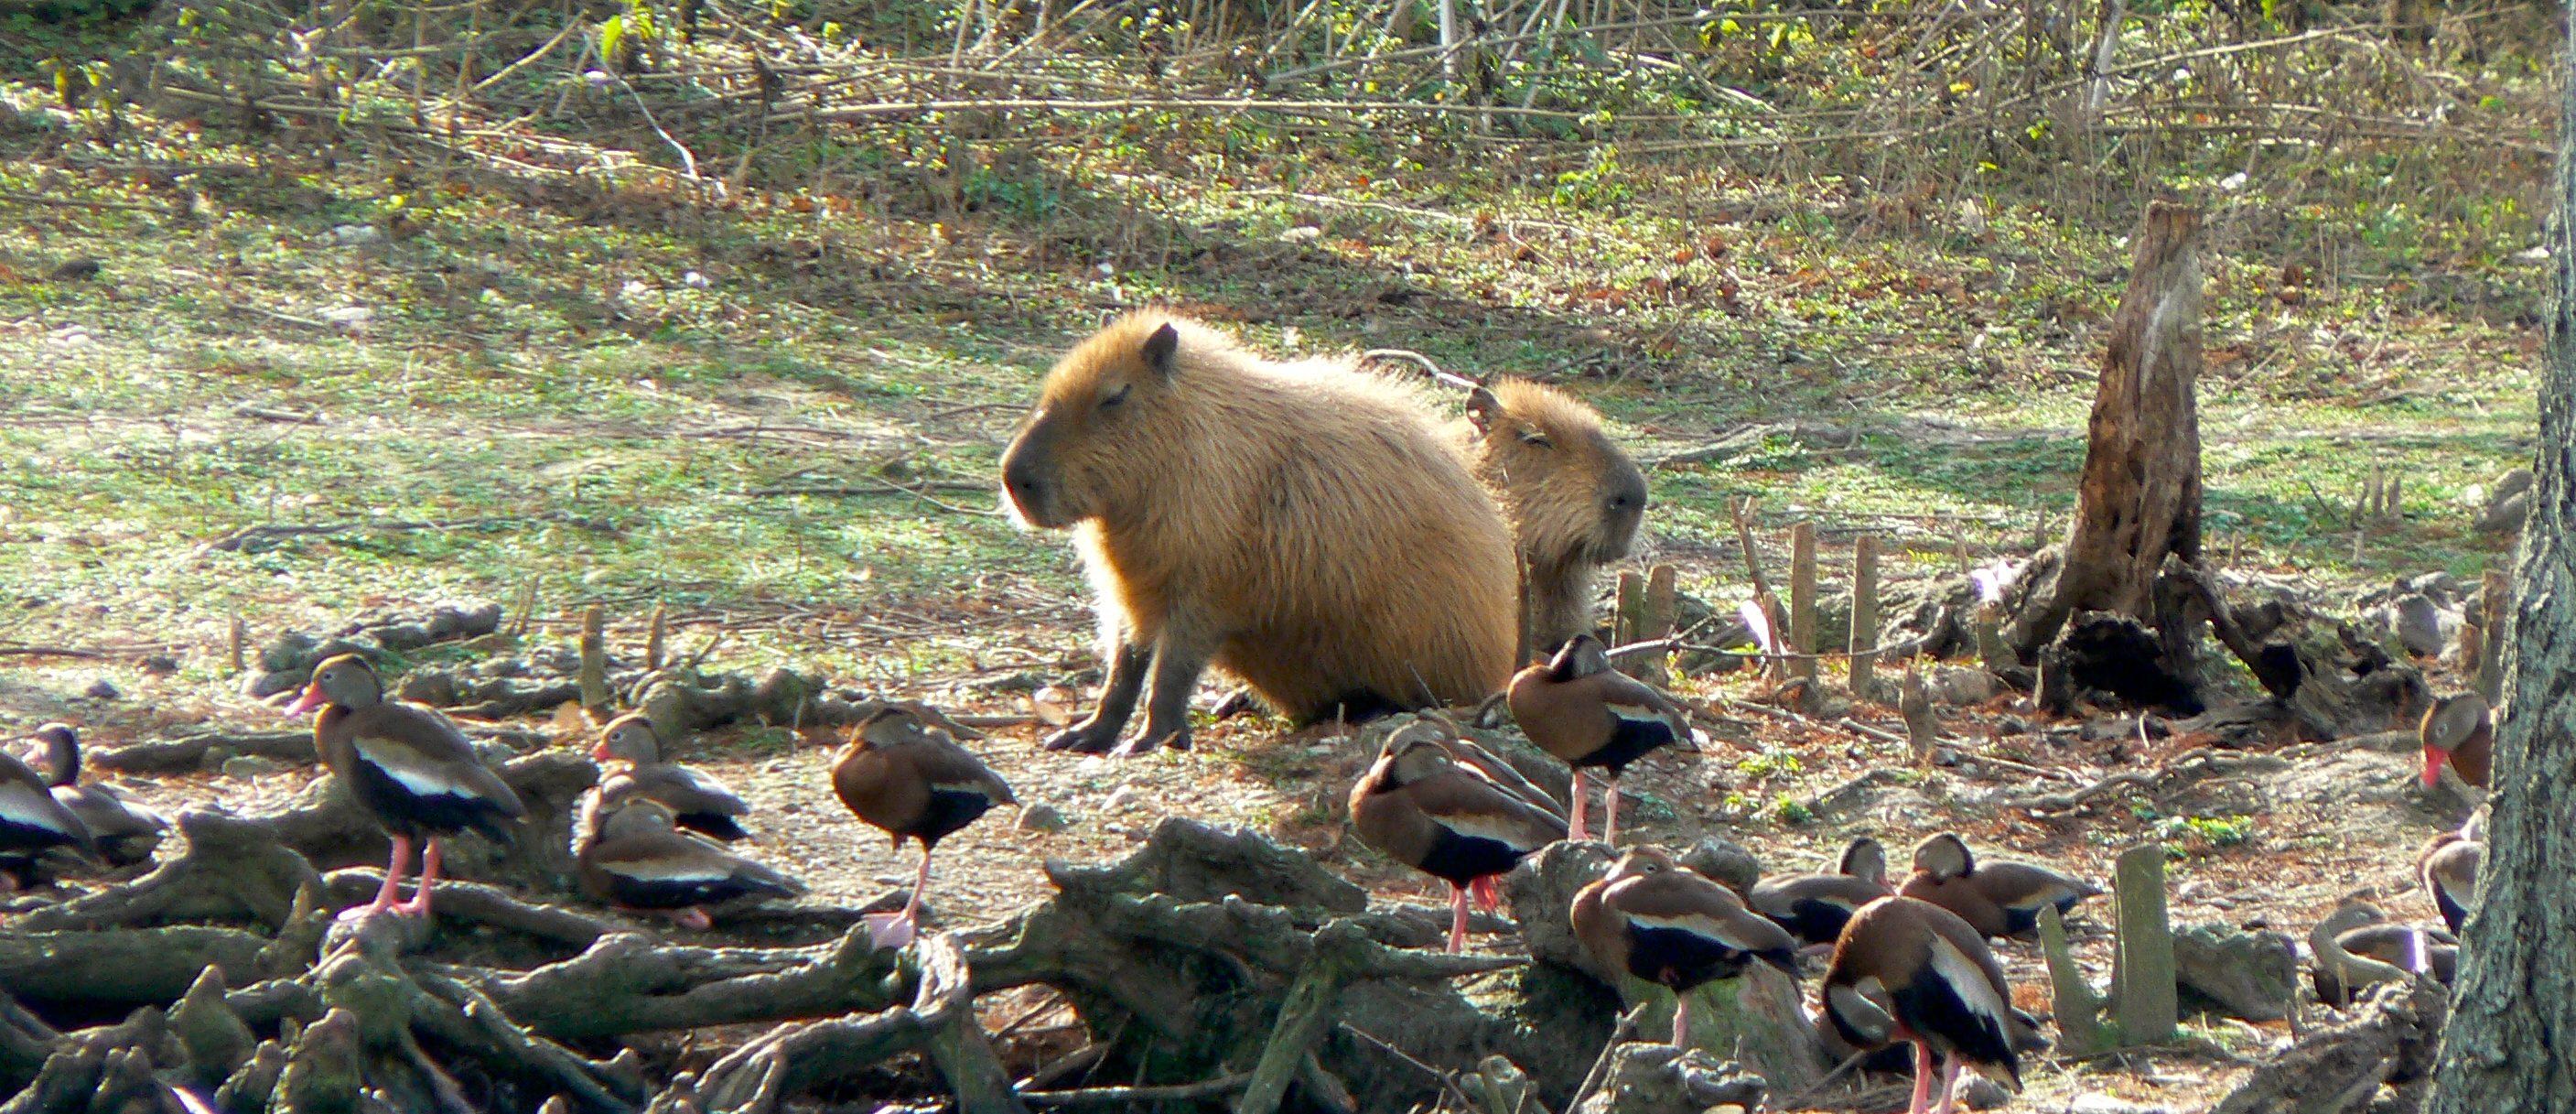 The Zoo Project: Capybara Version